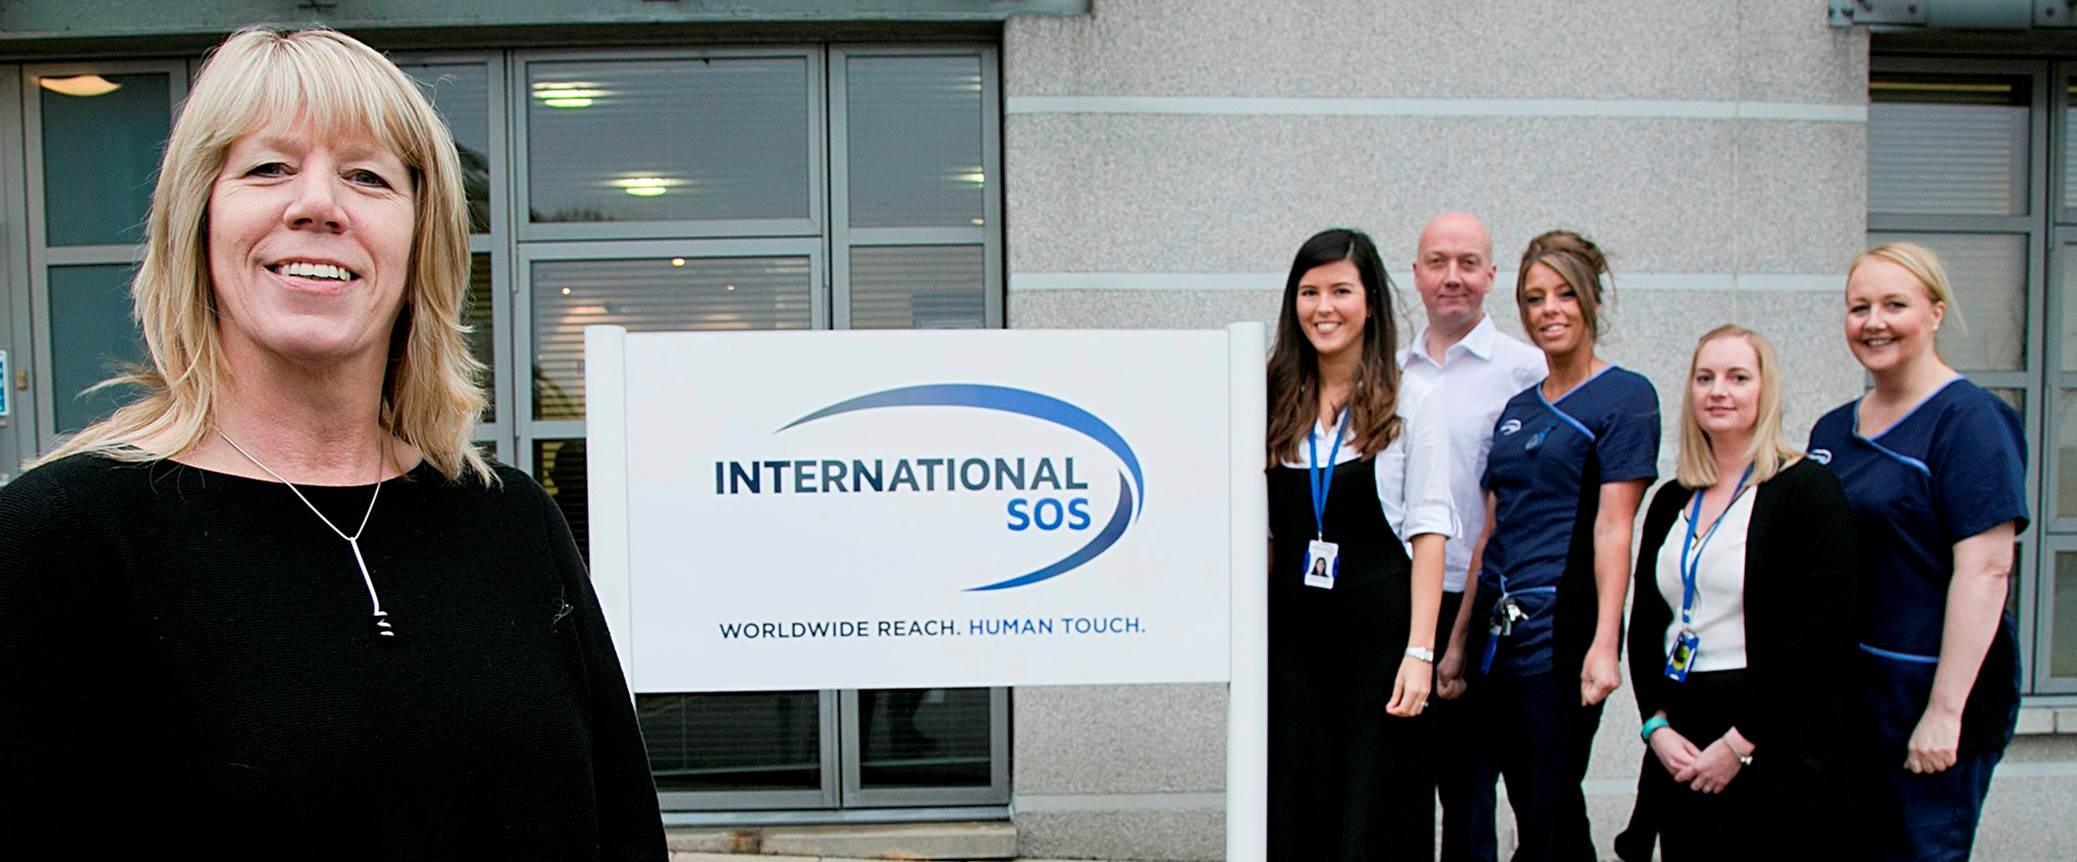 International SOS social committee raises over £1,100 for